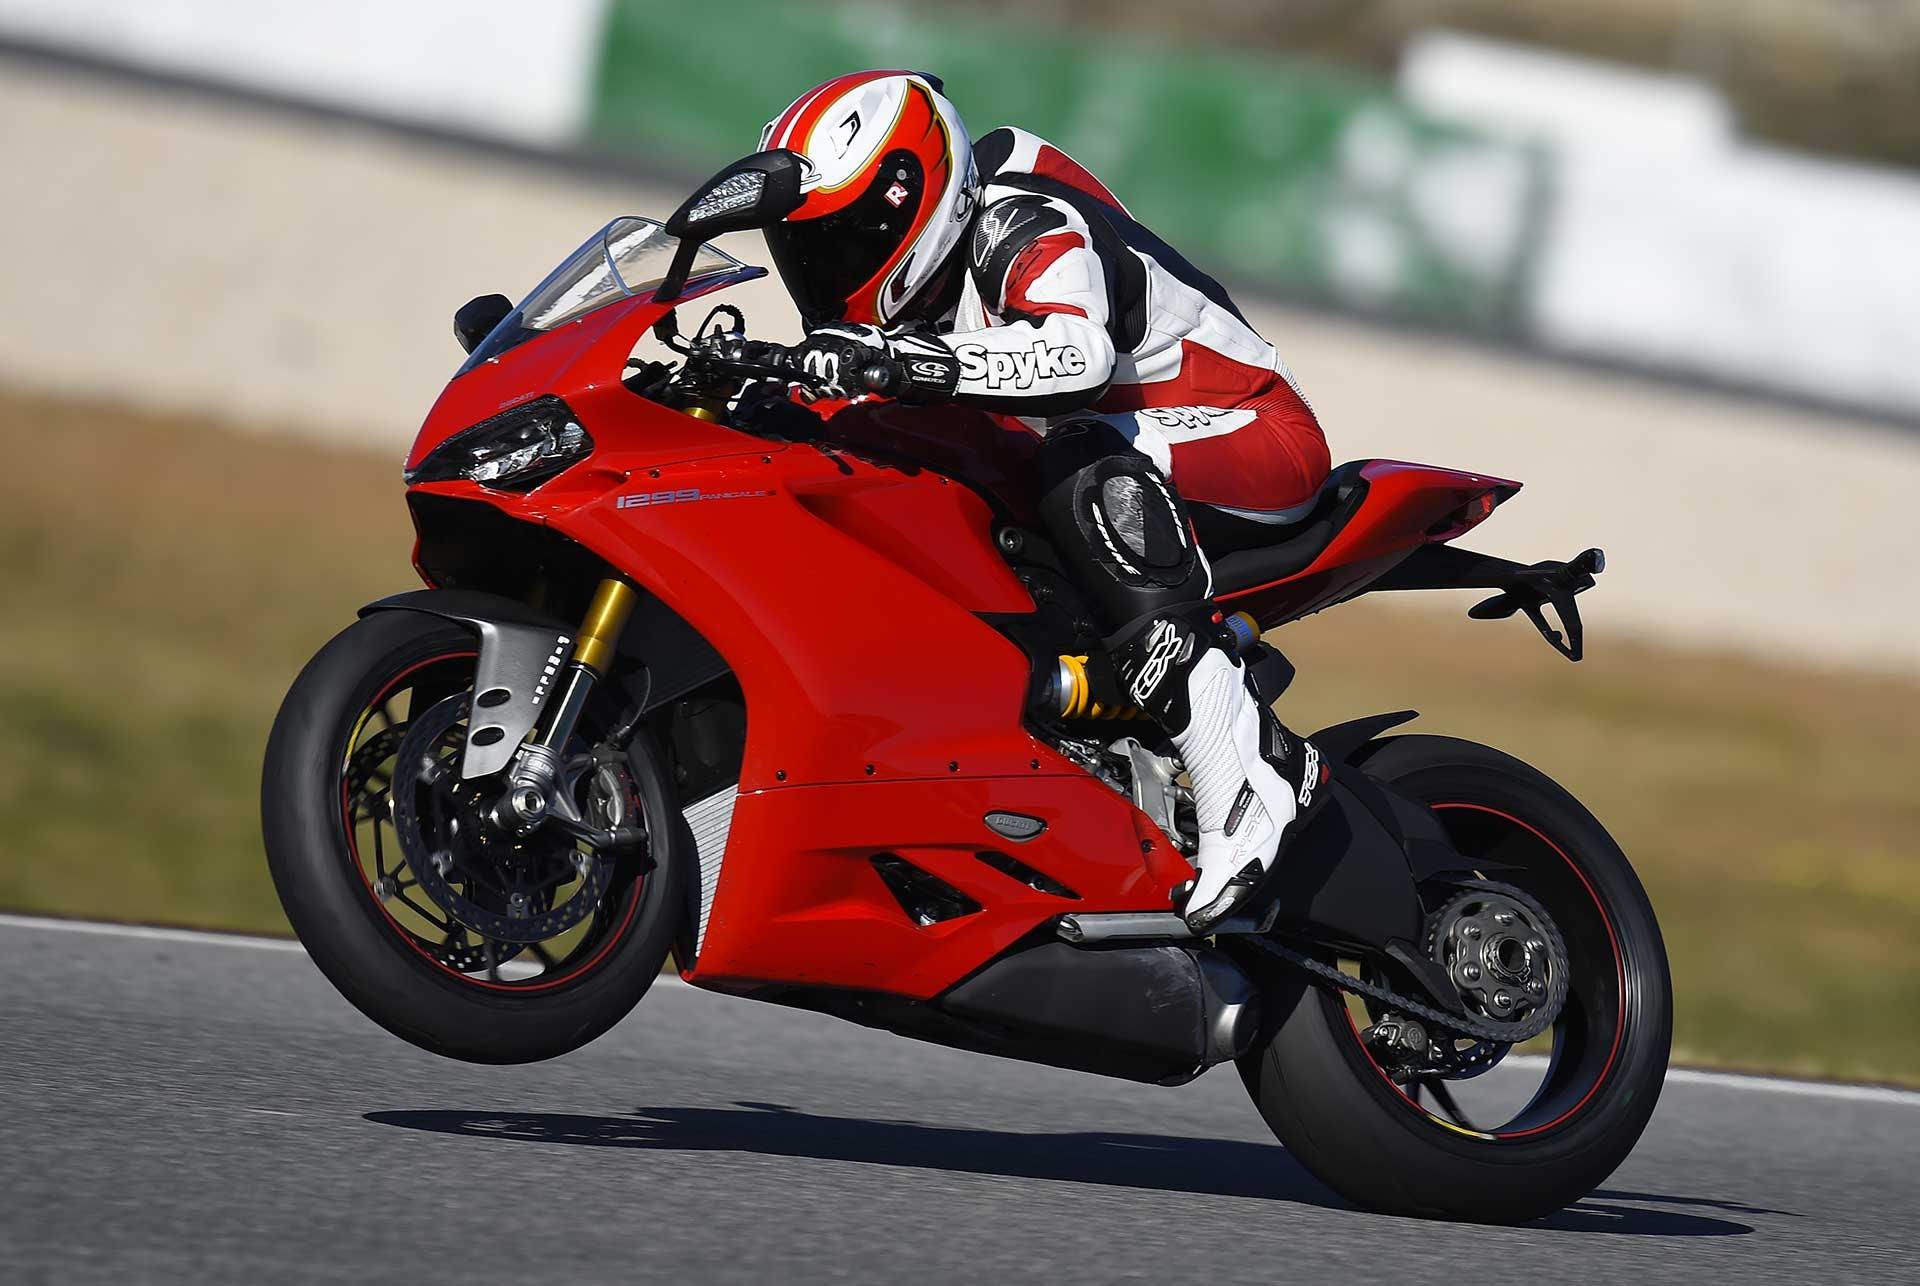 DucatiPanigale1299S-025